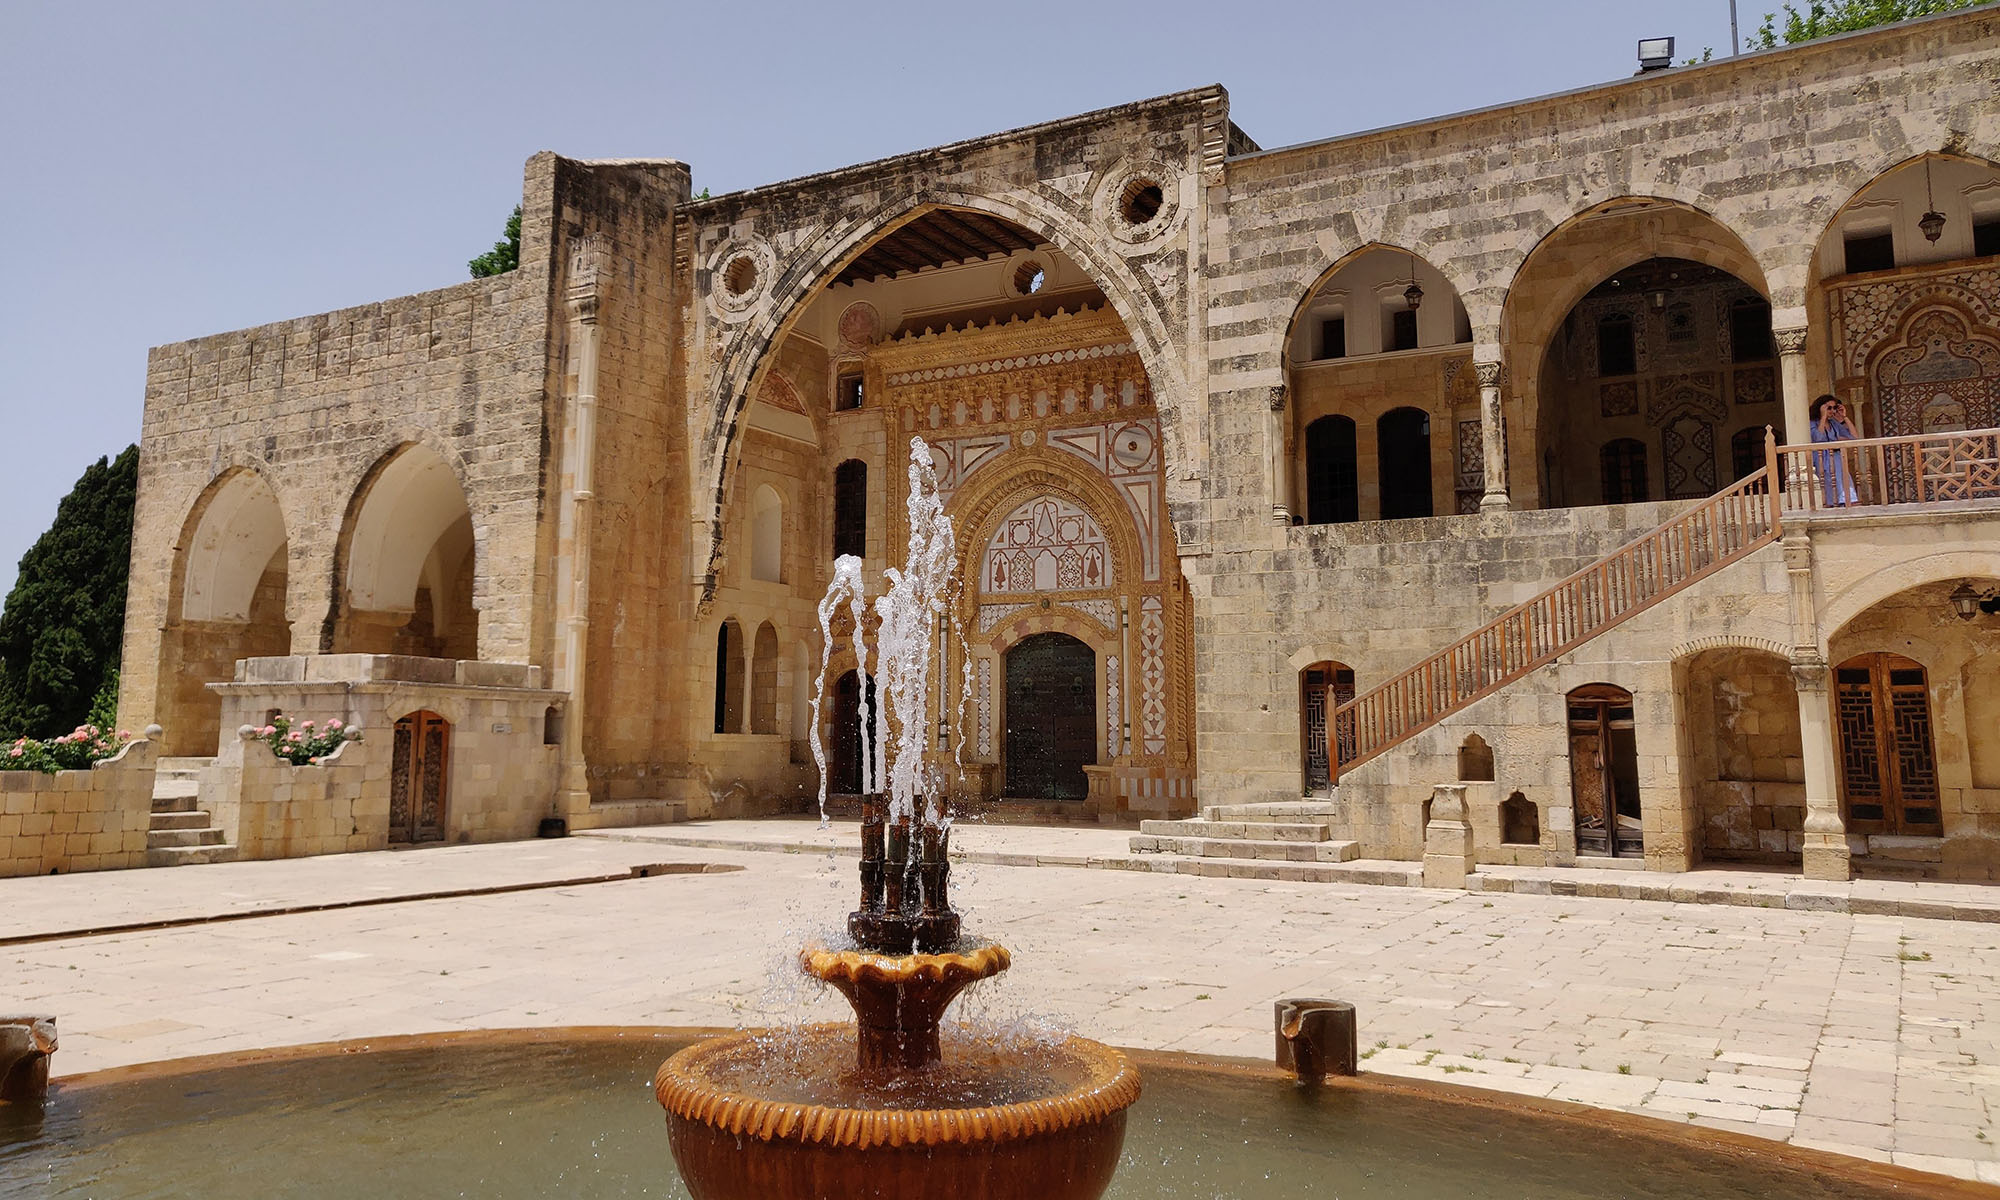 Libanon Beit Ed Dine Paleis Fontein